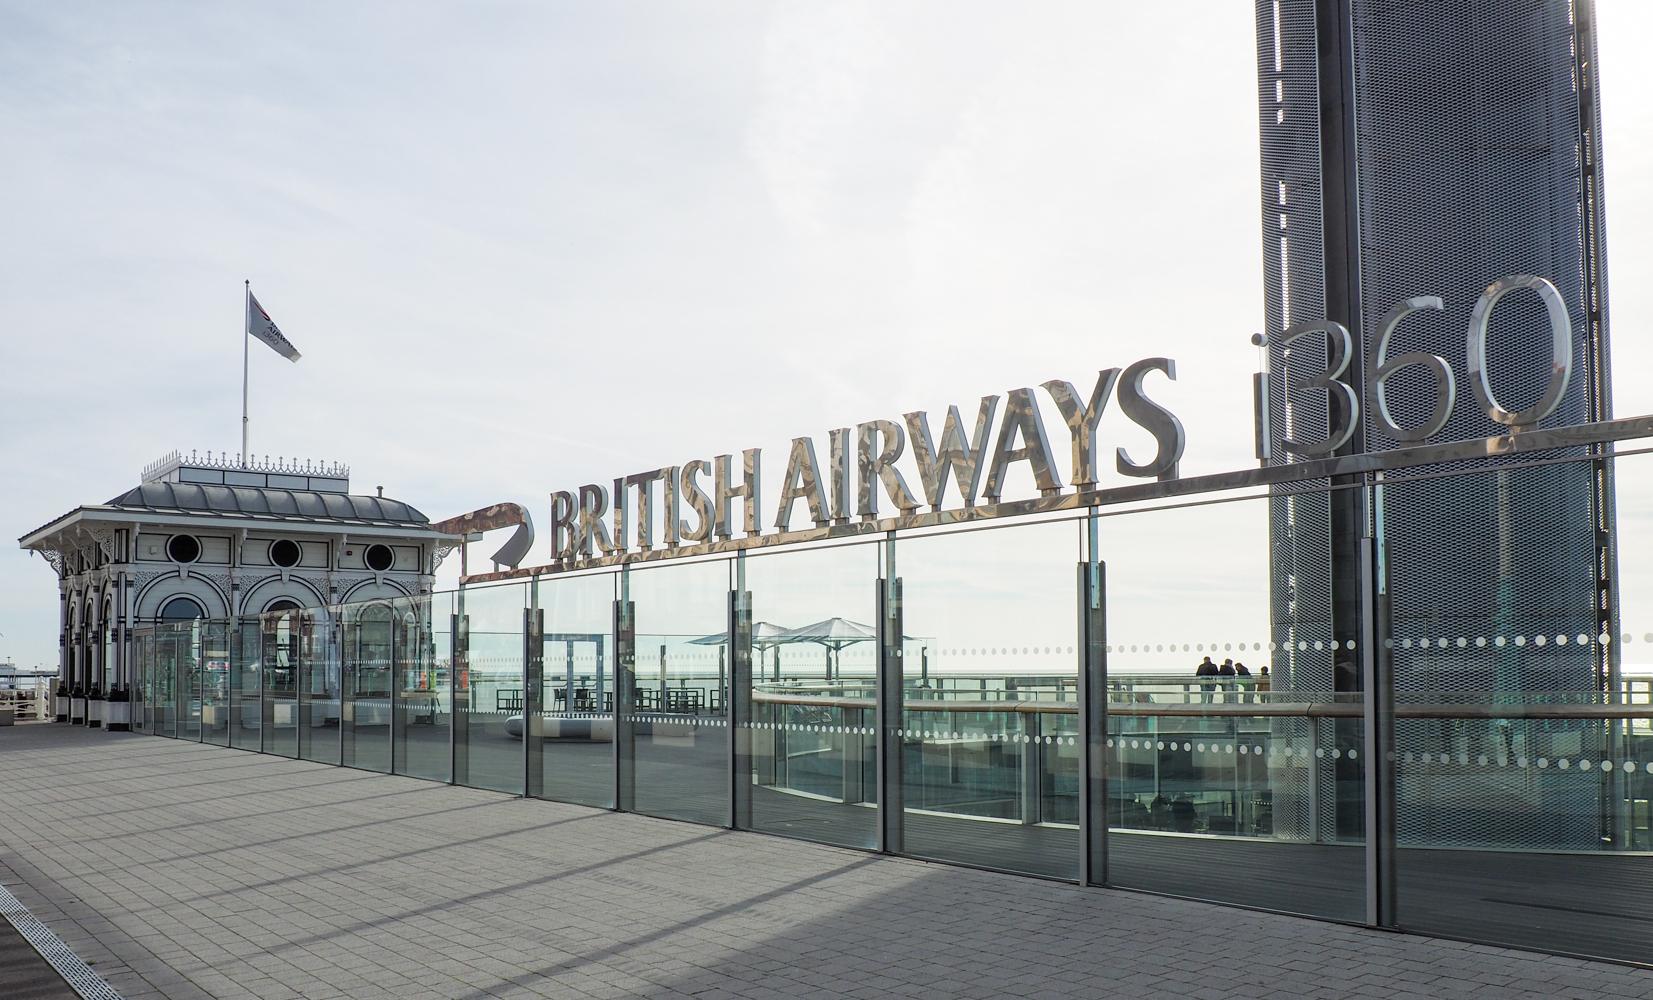 Places to visit in Brighton